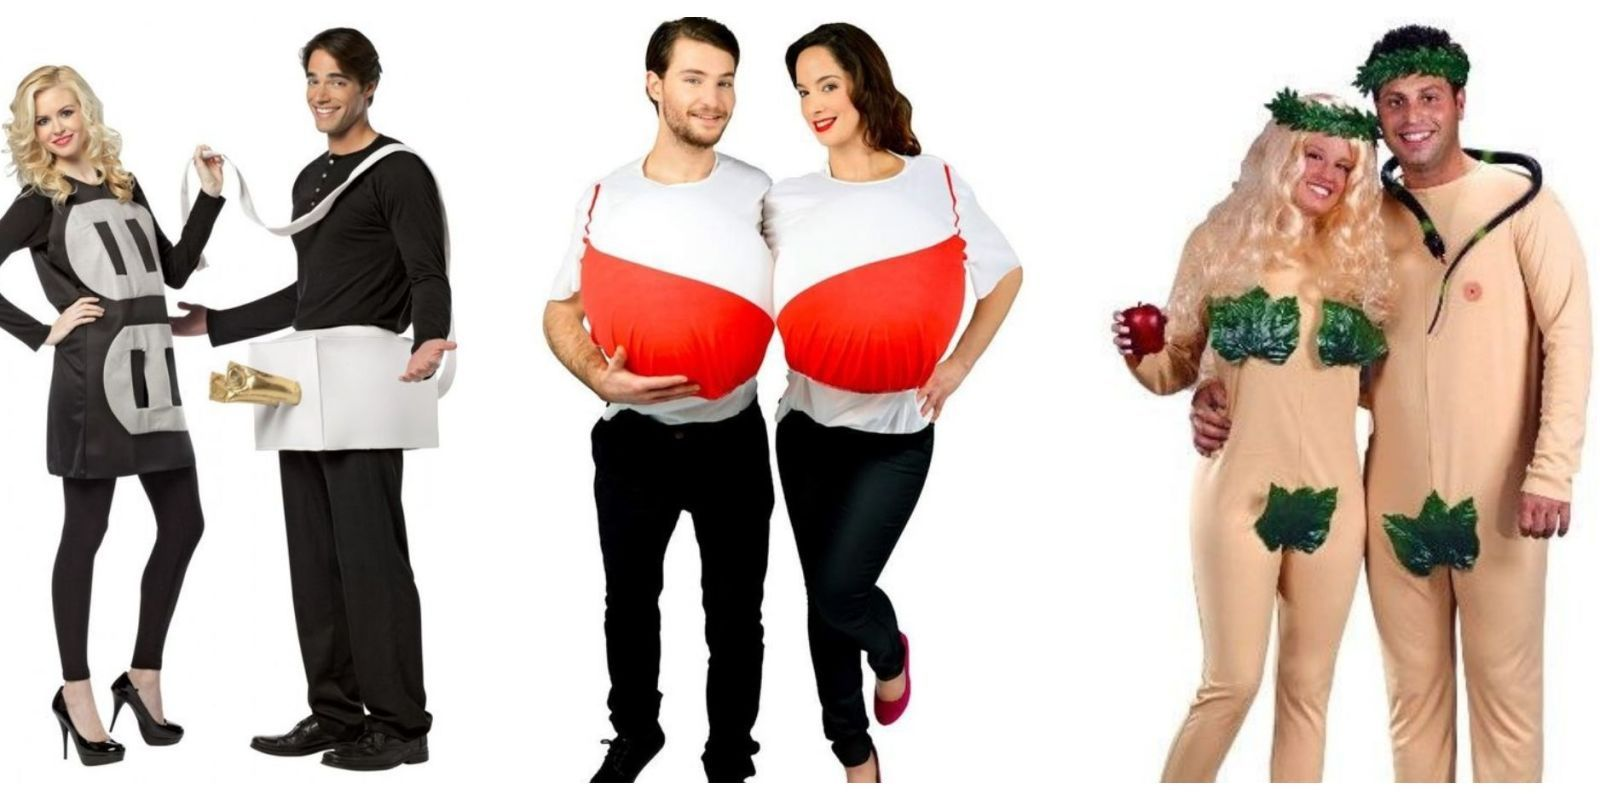 15 Halloween Couple Costumes Ideas That Make Us Cringe